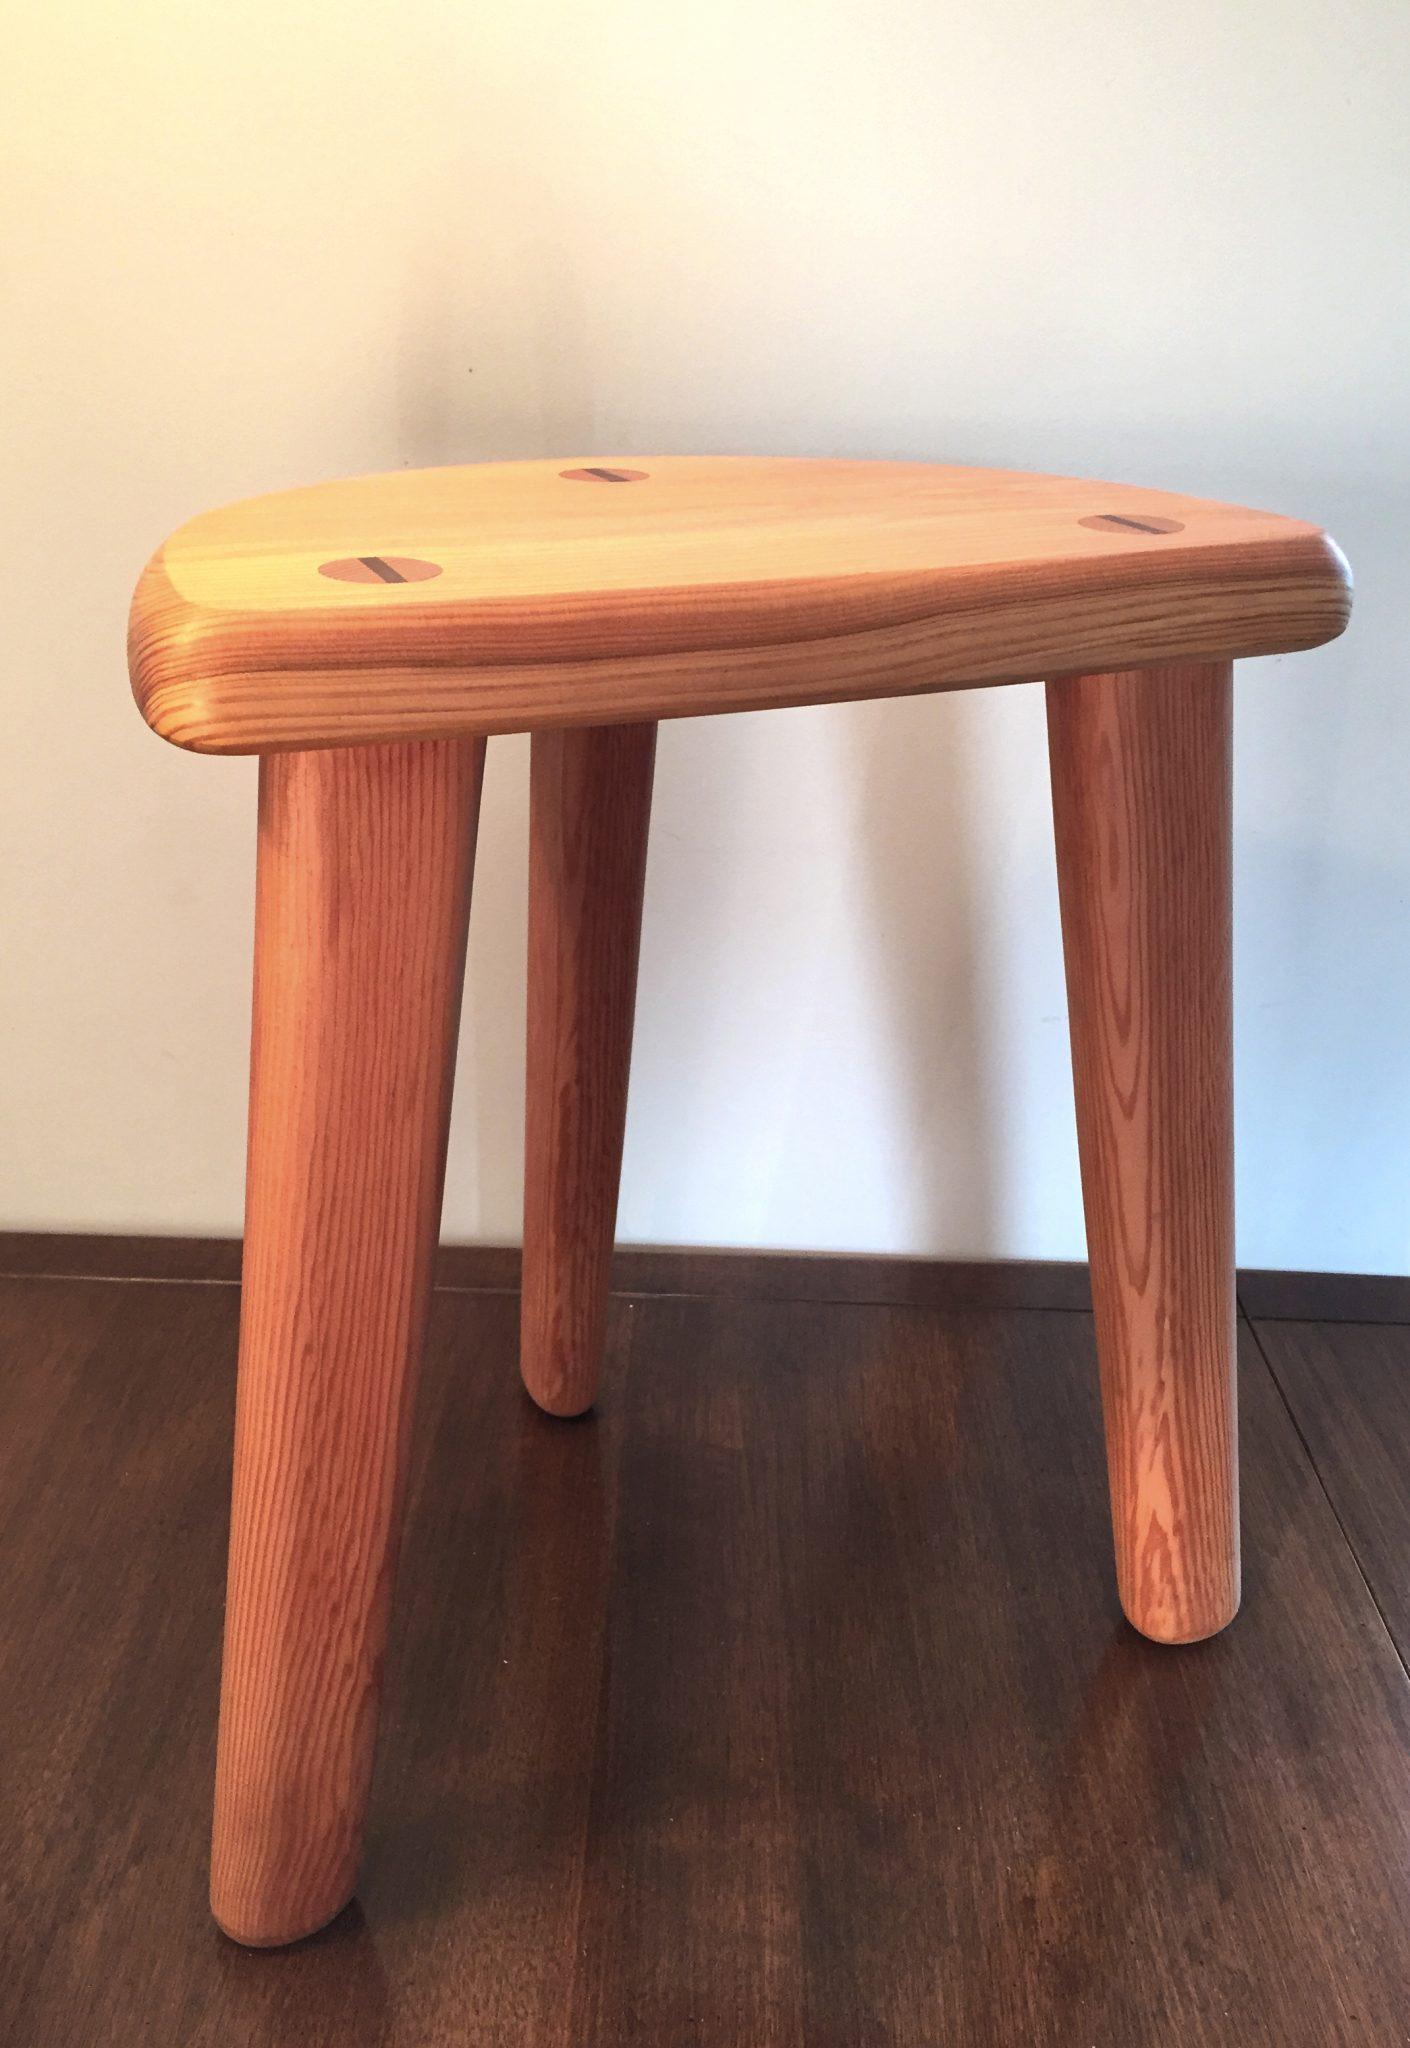 milking stool craig thomson scotland handmade furniture